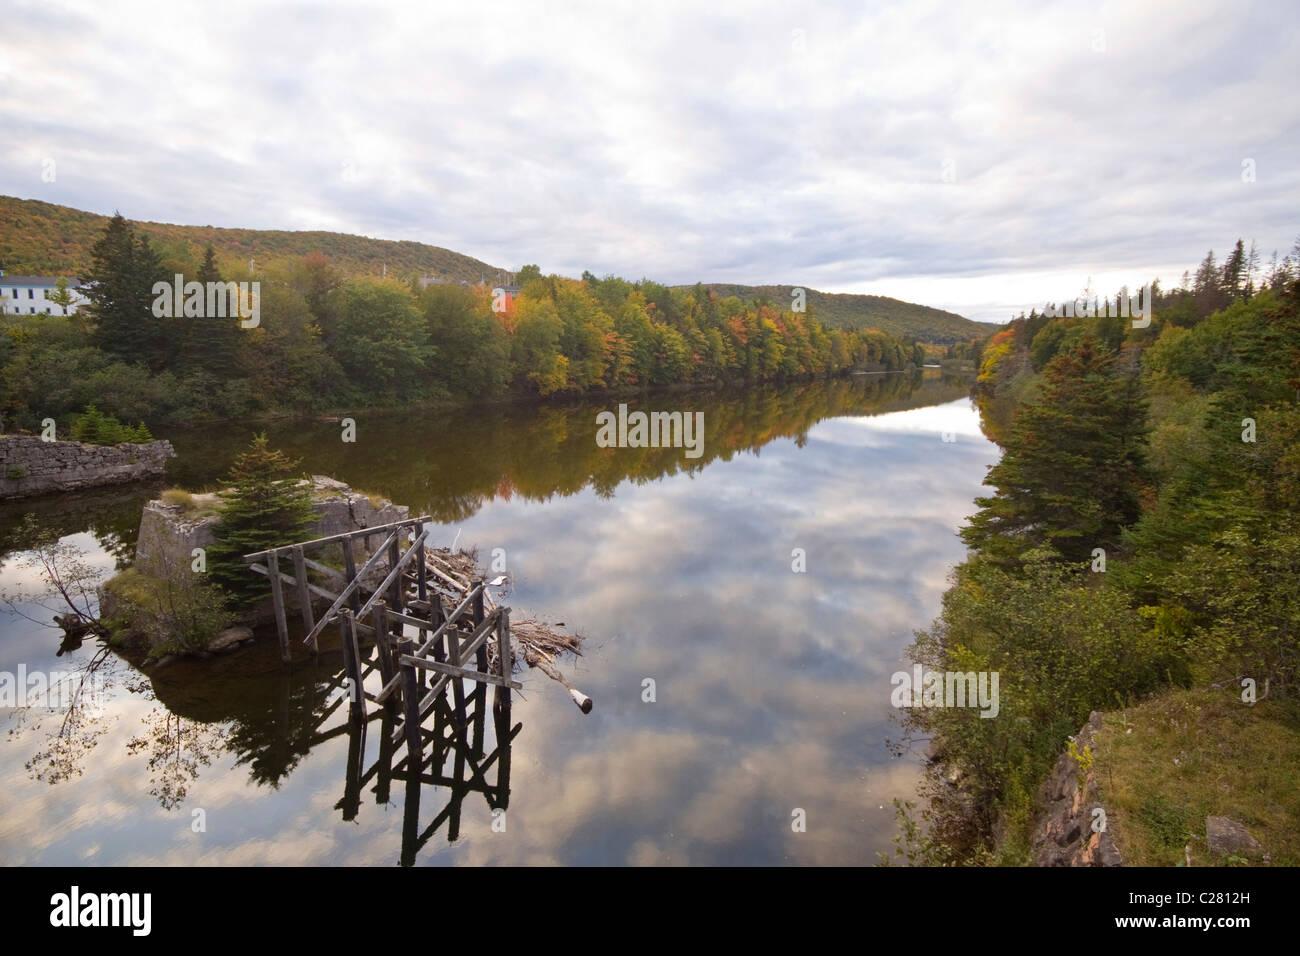 Middle River autumn reflections, near Nyanza, Cape Breton, Nova Scotia - Stock Image